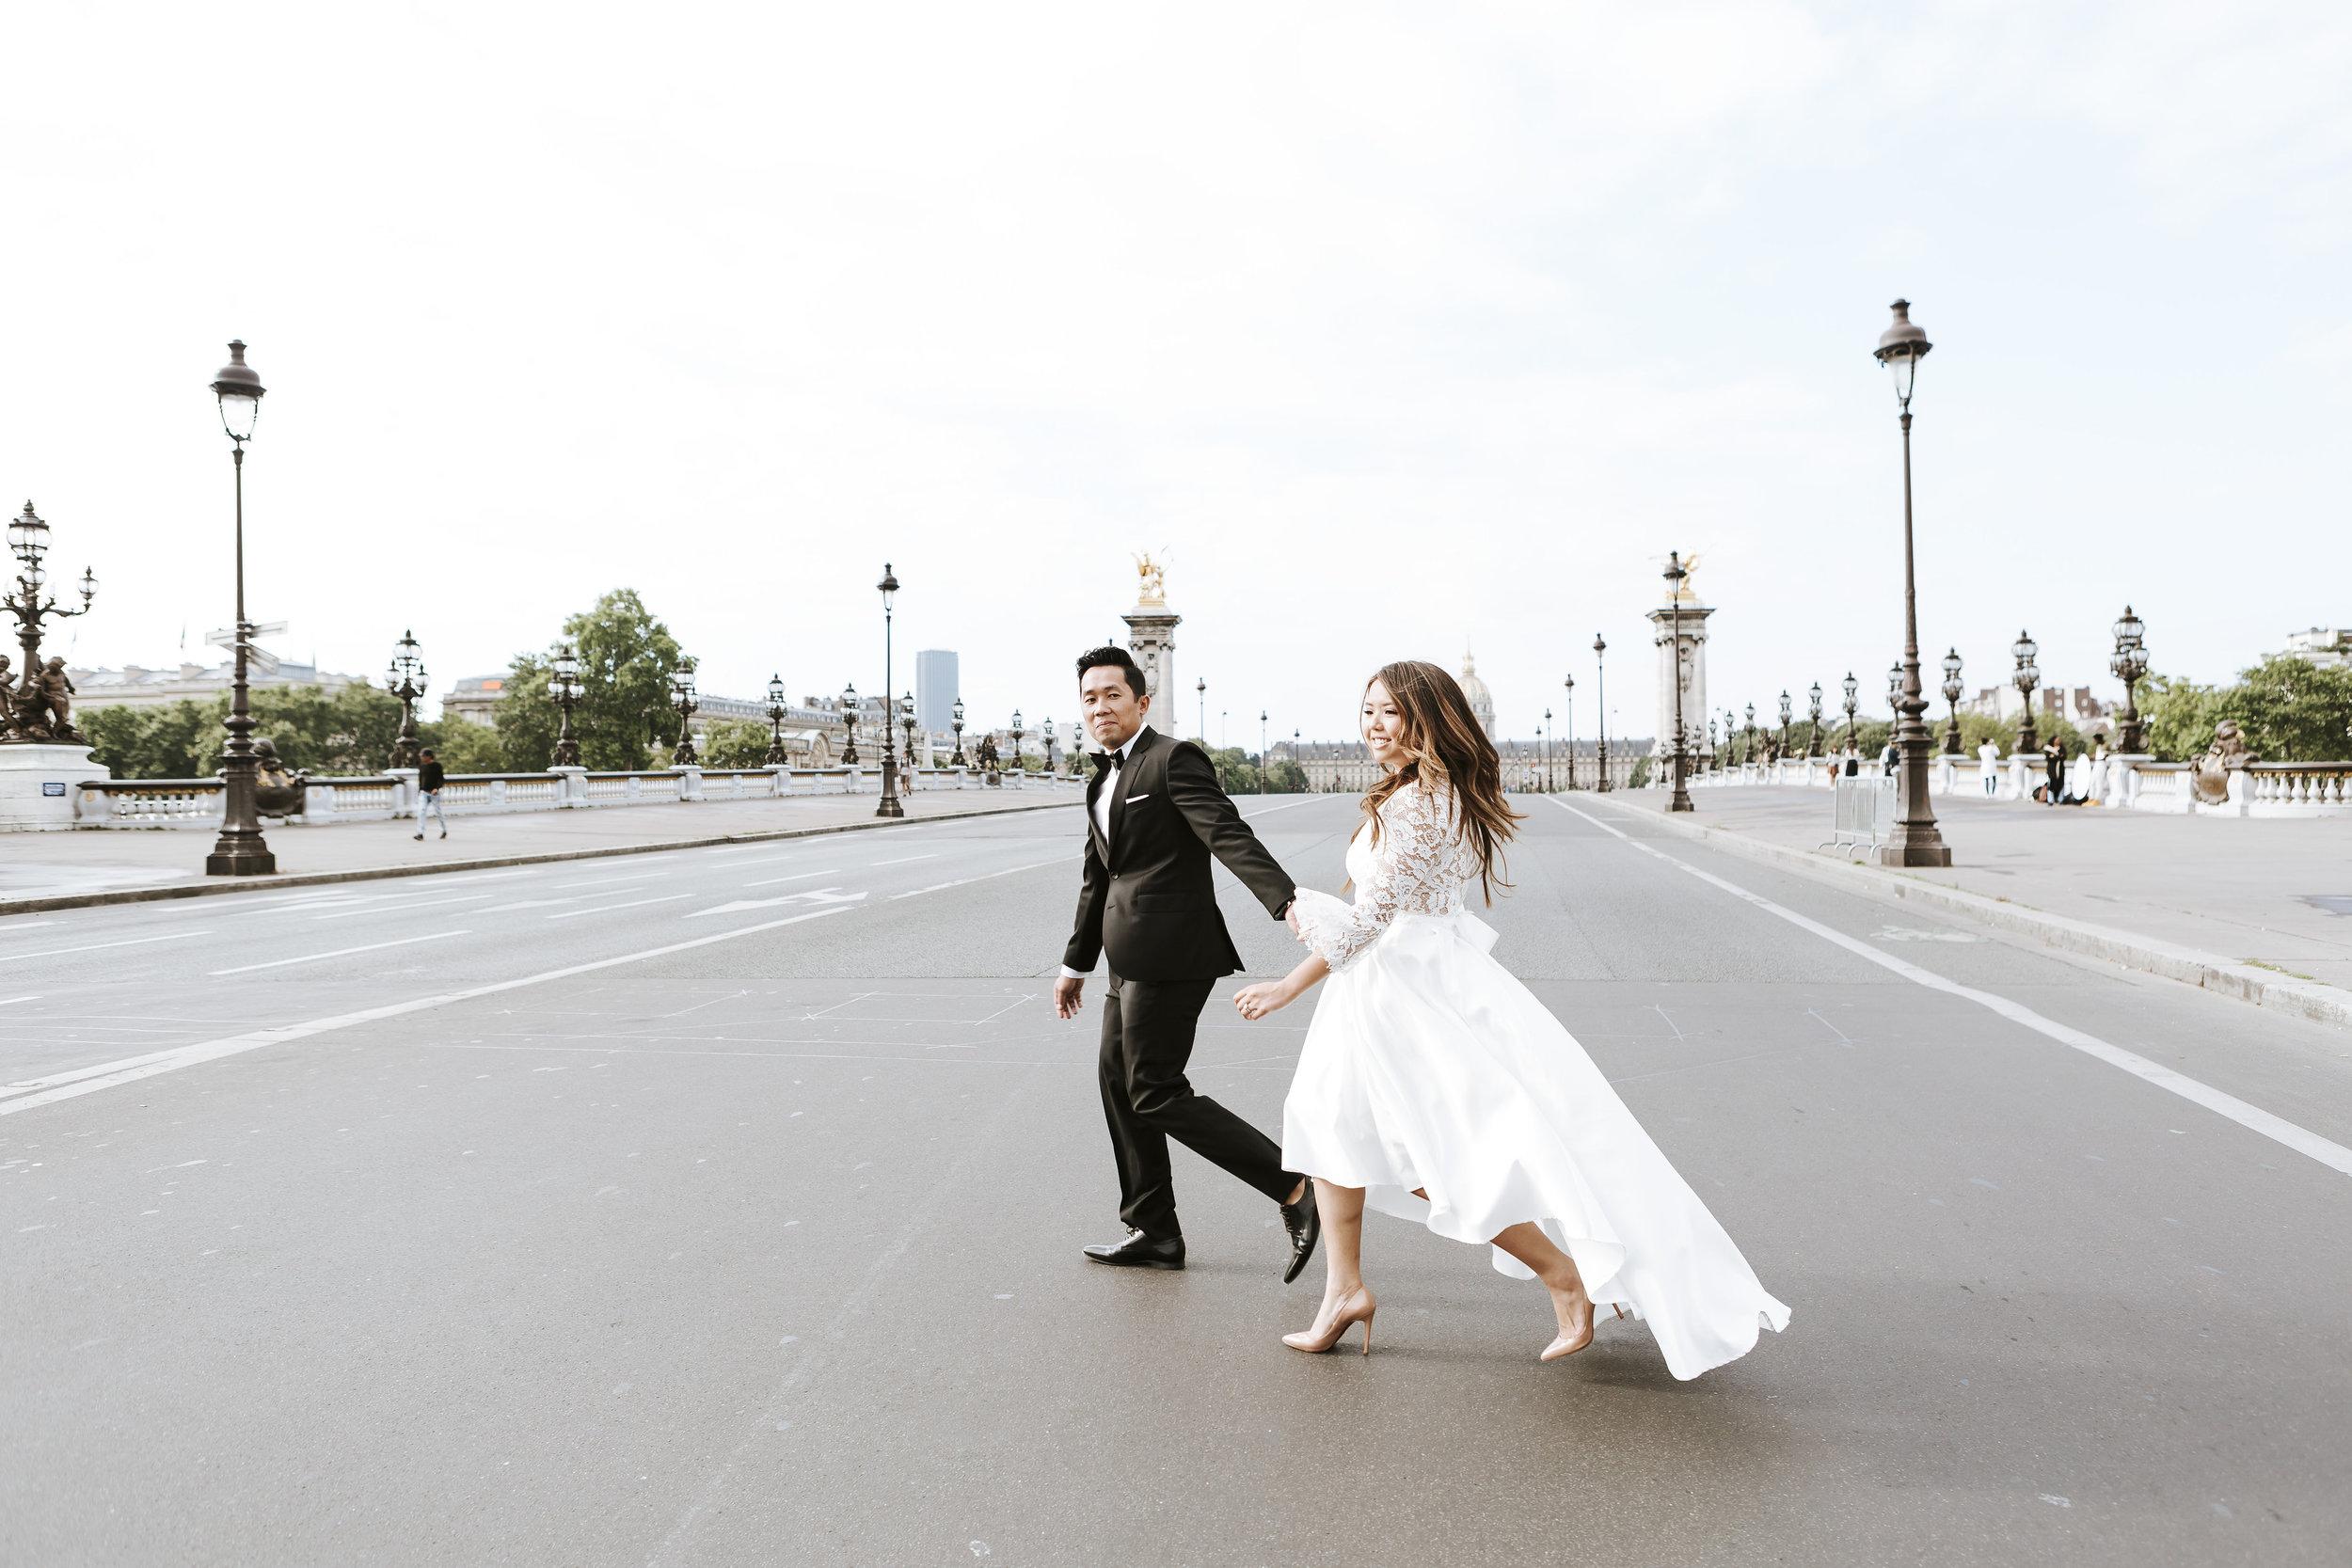 paris photographer federico guendel pre-wedding couple portrait session running across alexandre III bridge